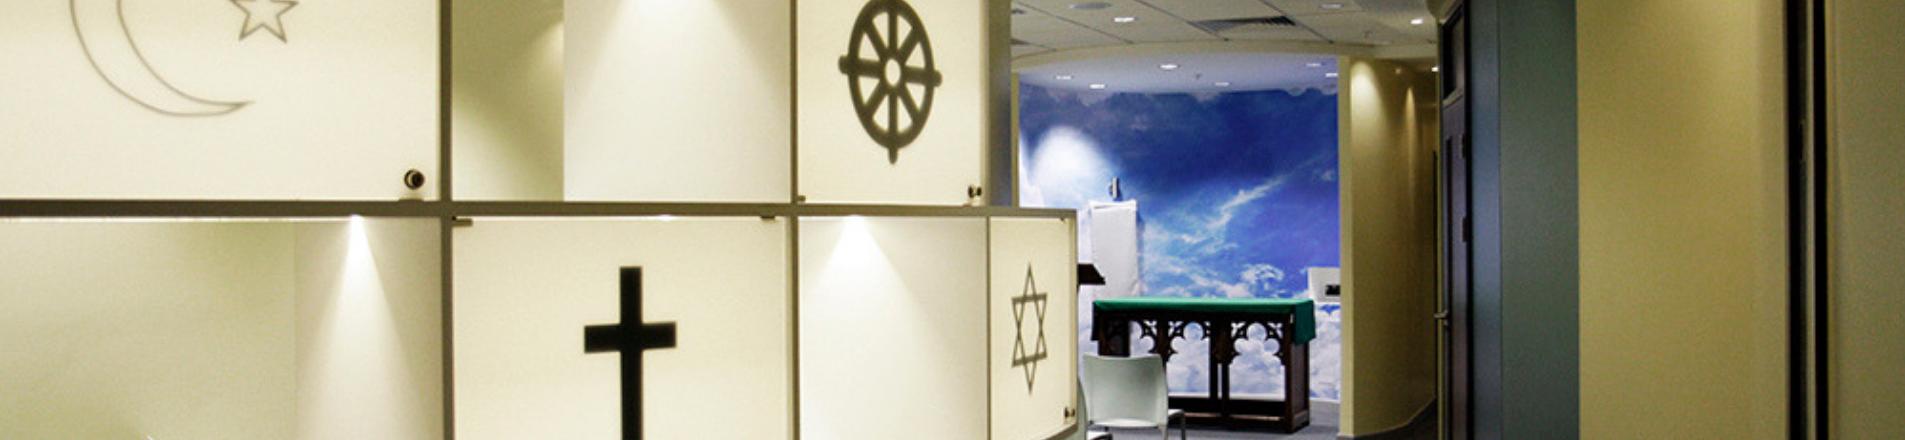 multi-faith room at Gatwick Airport